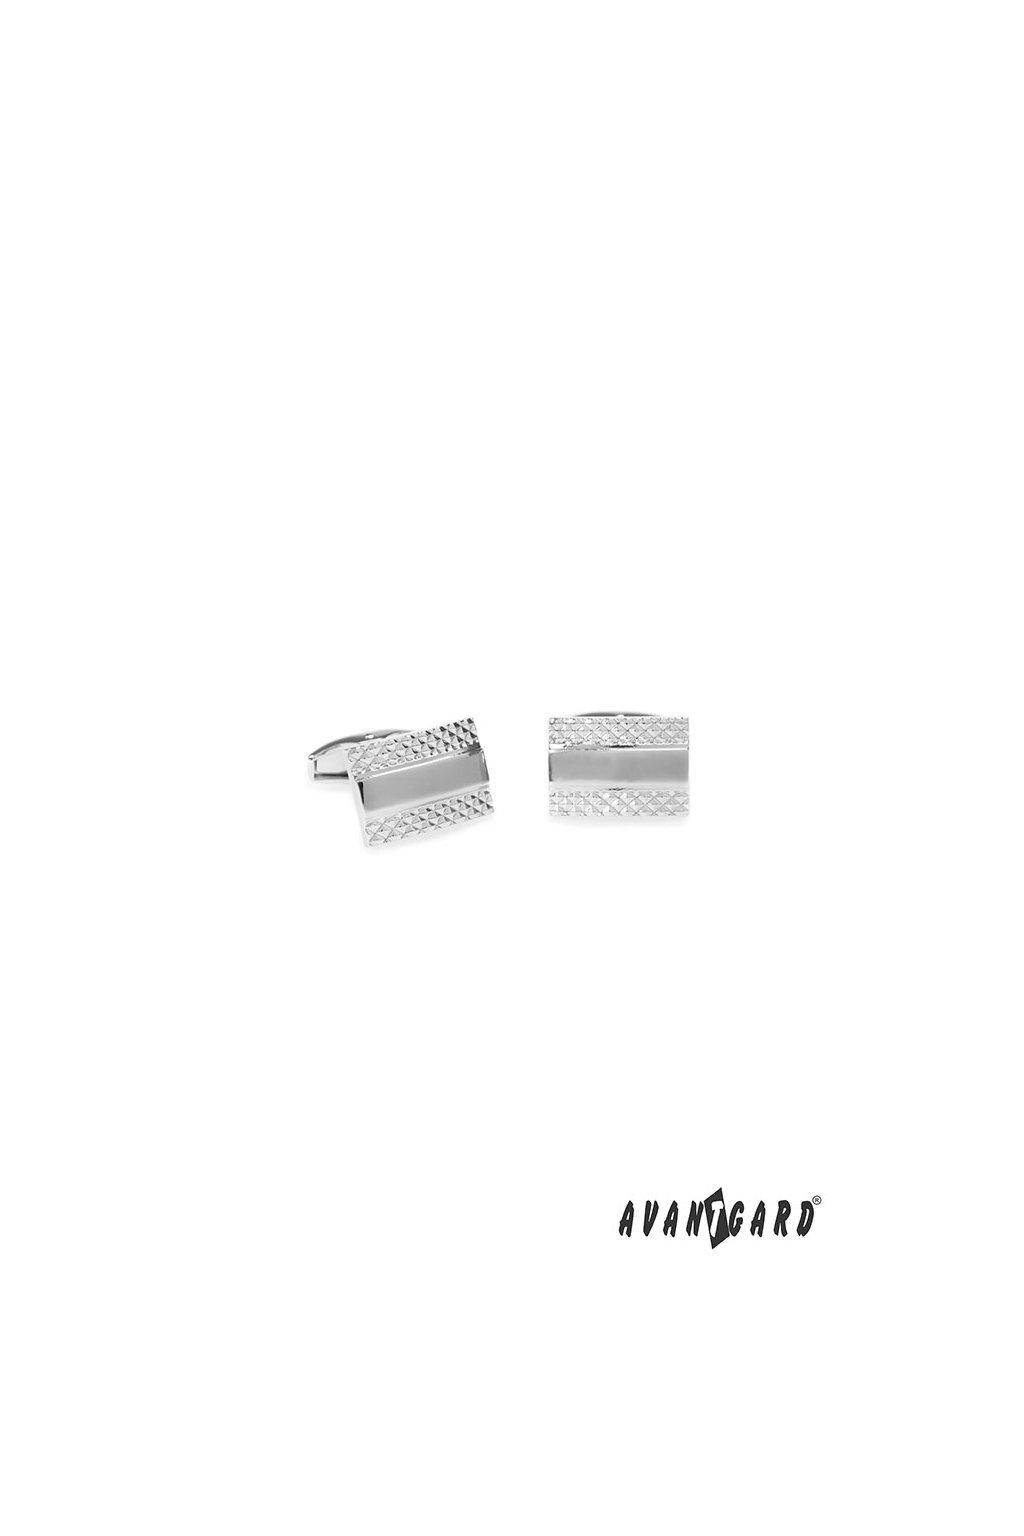 Manžetové knoflíčky AVANTGARD PREMIUM stříbrná lesk 573 - 20746